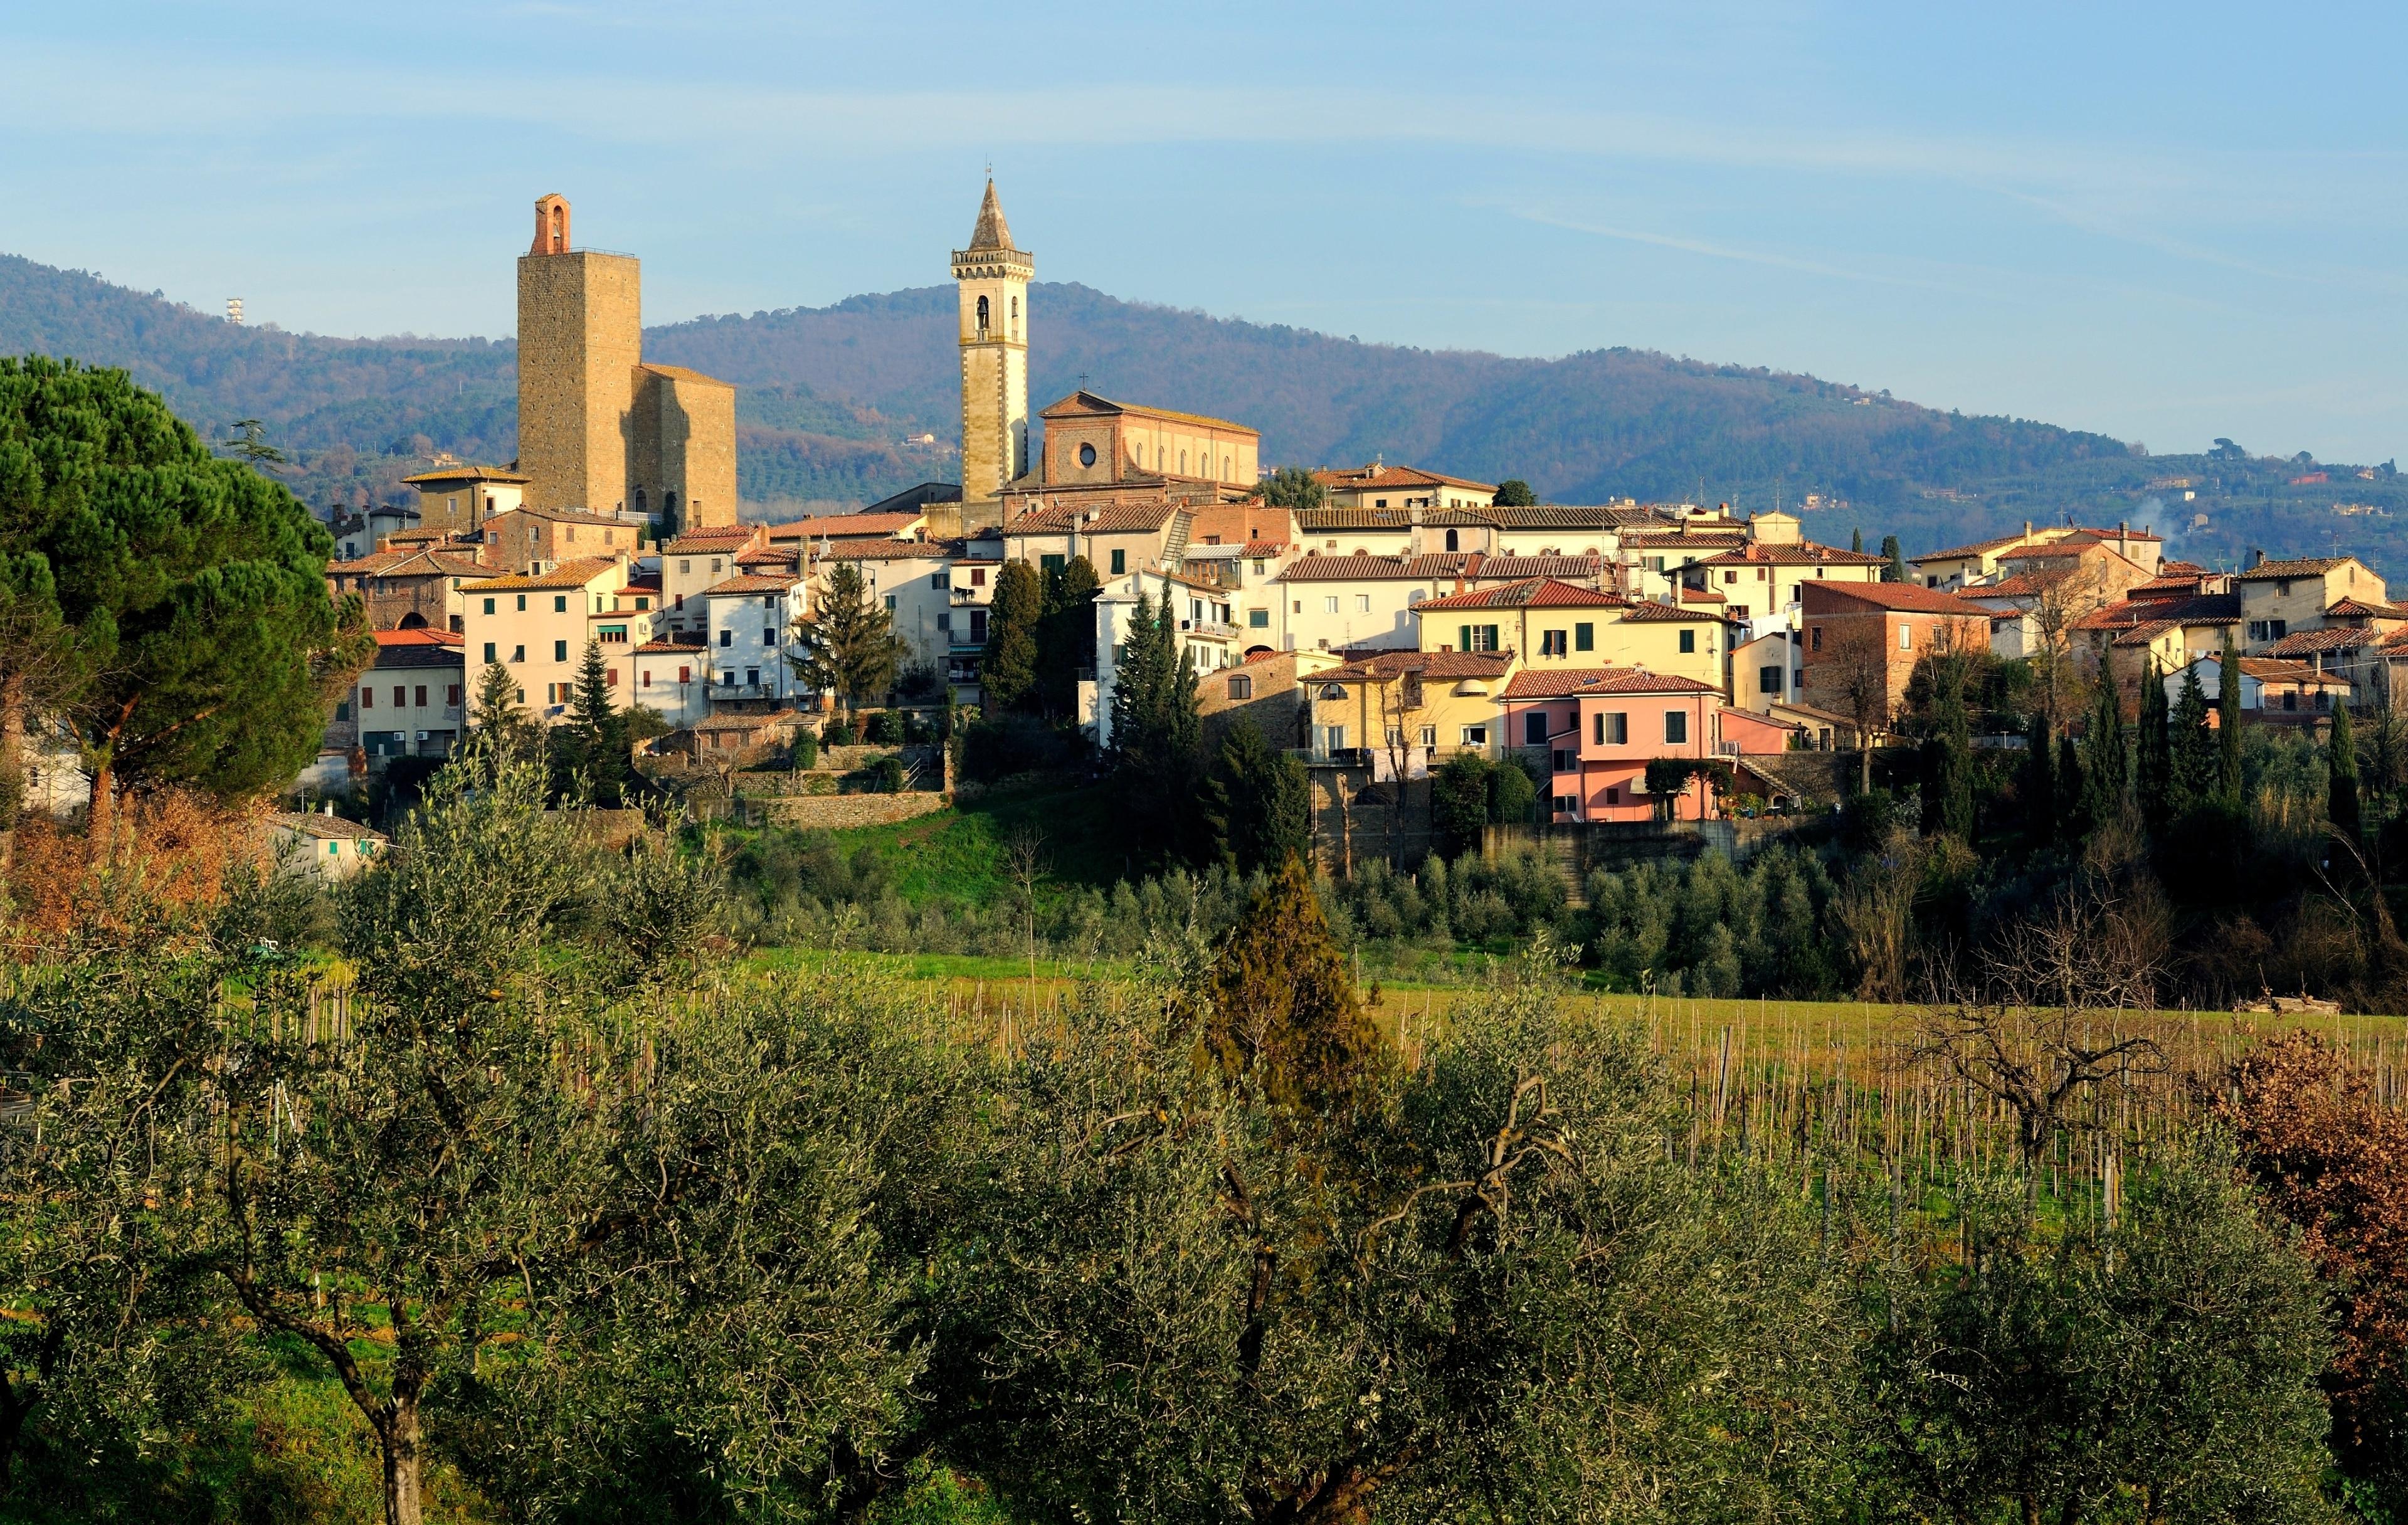 Vinci, Tuscany, Italy